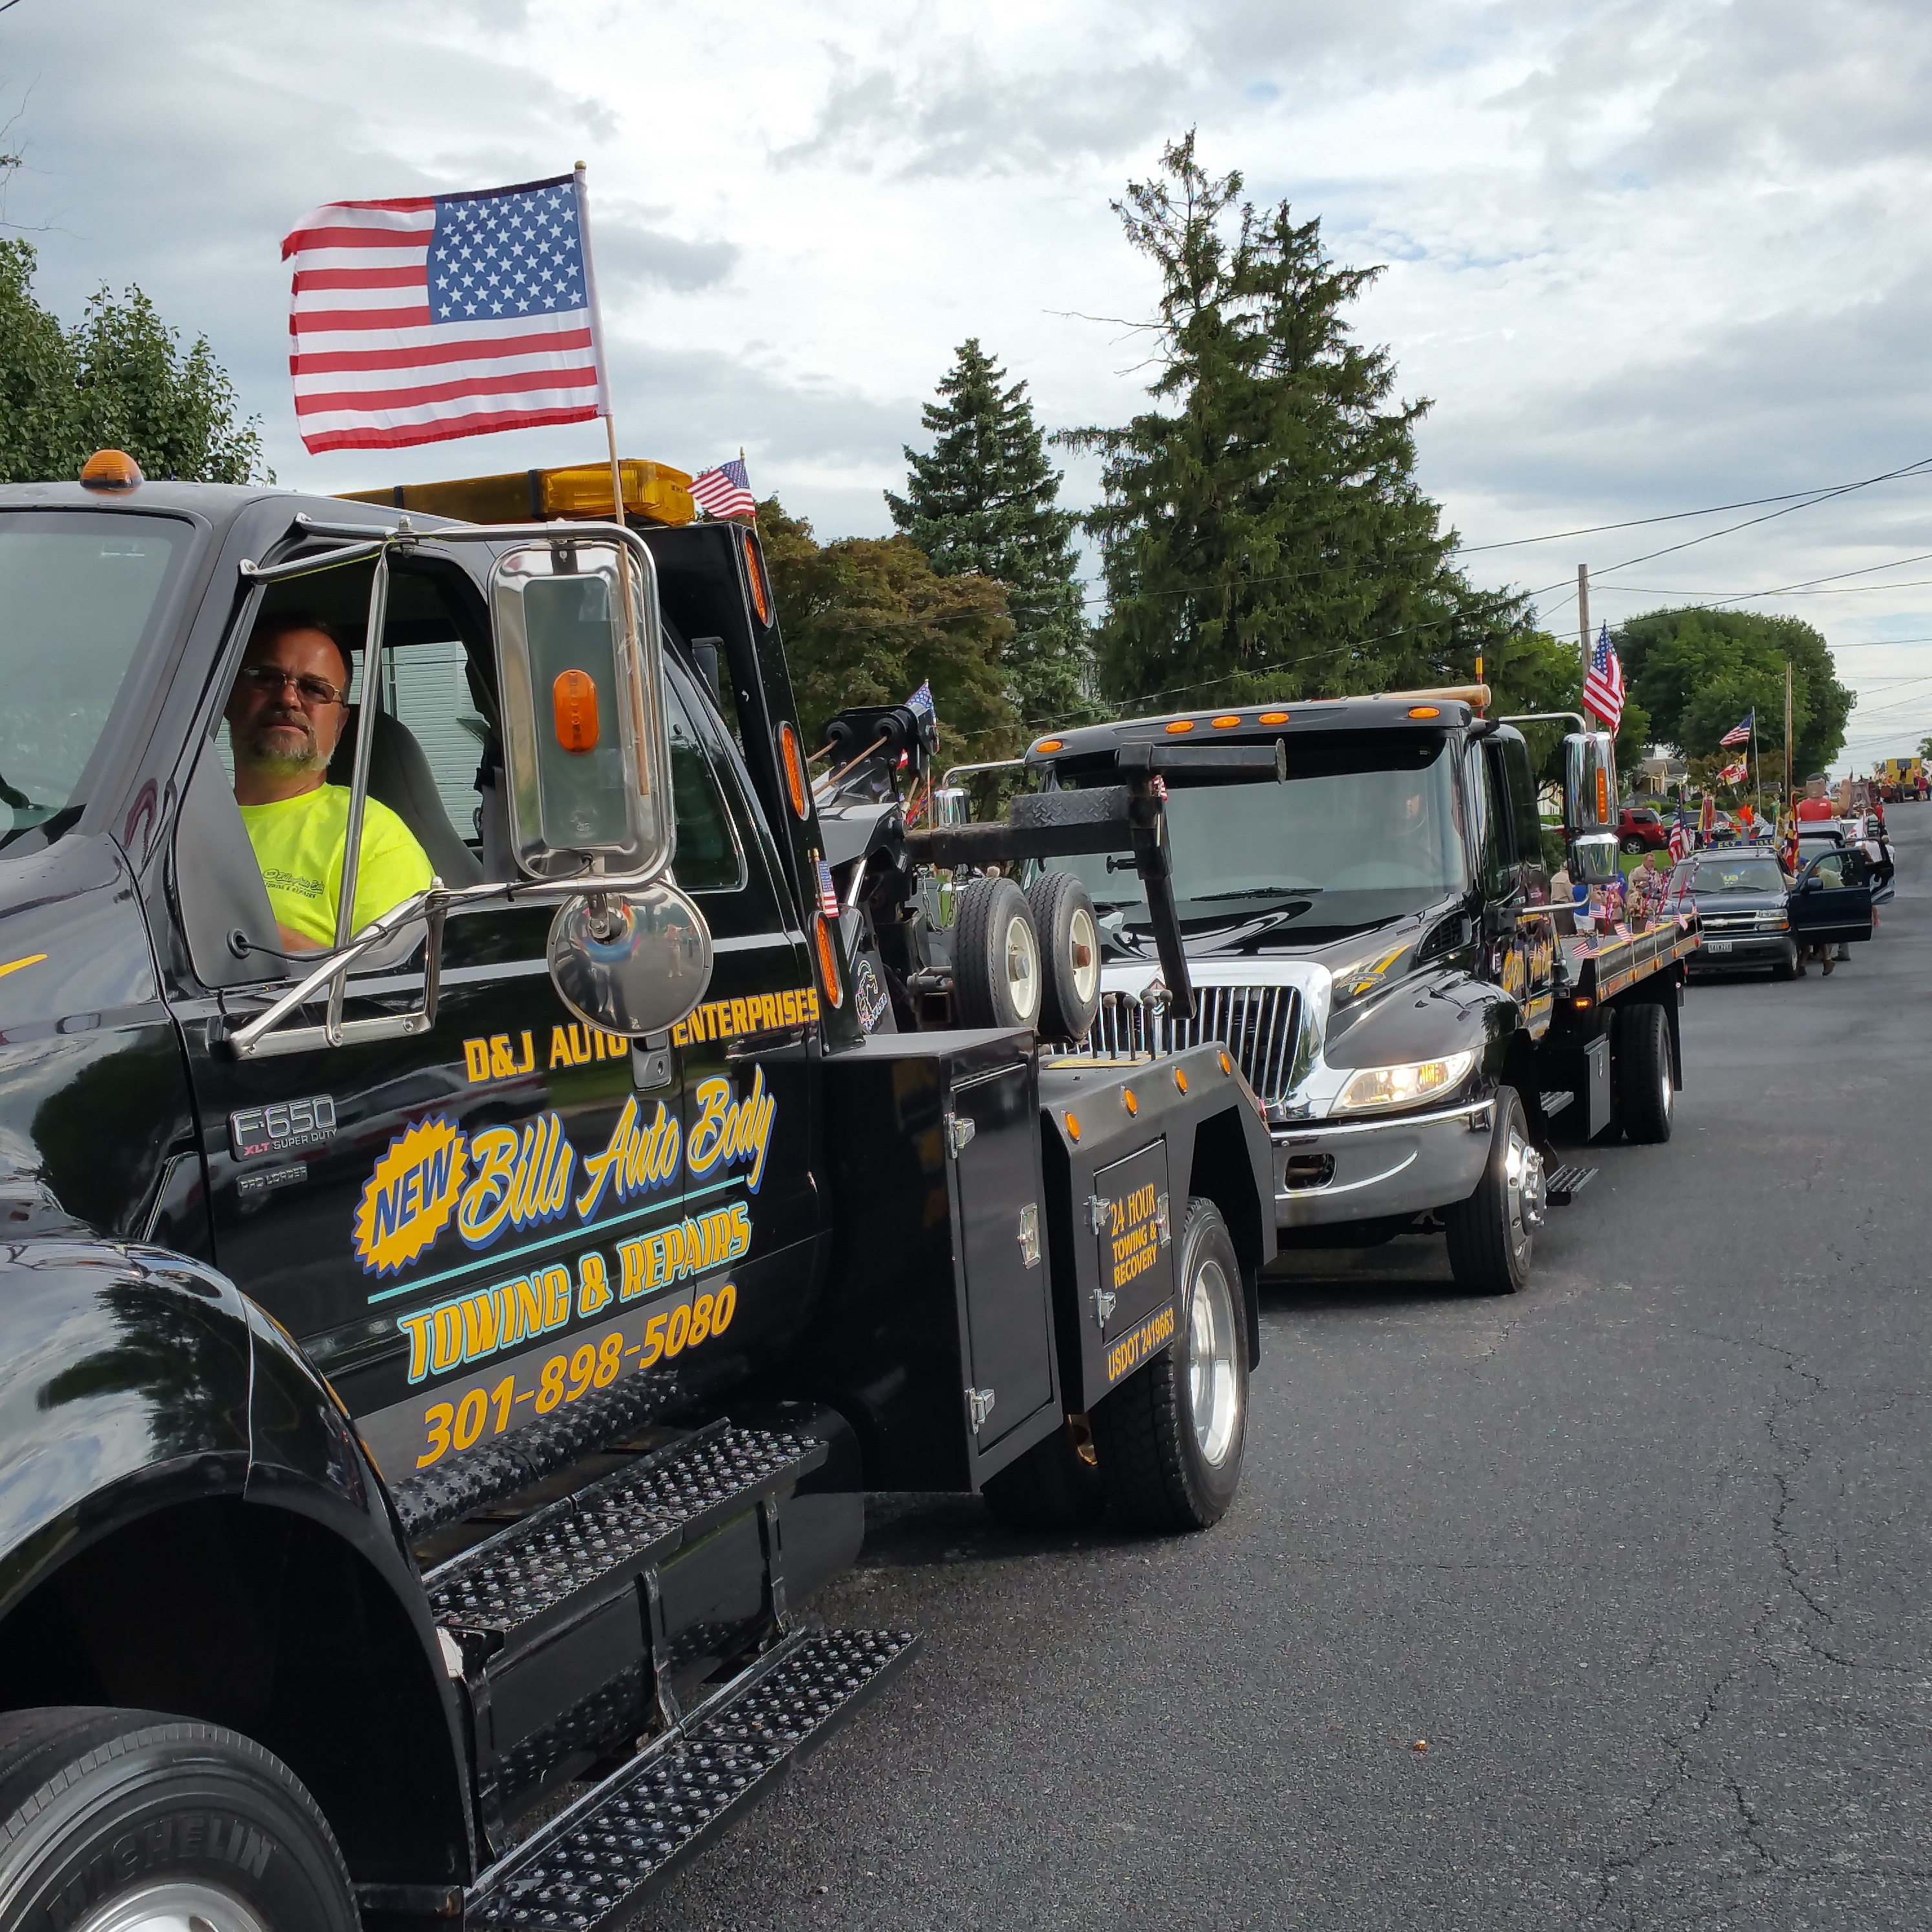 parade 2015 thurmont